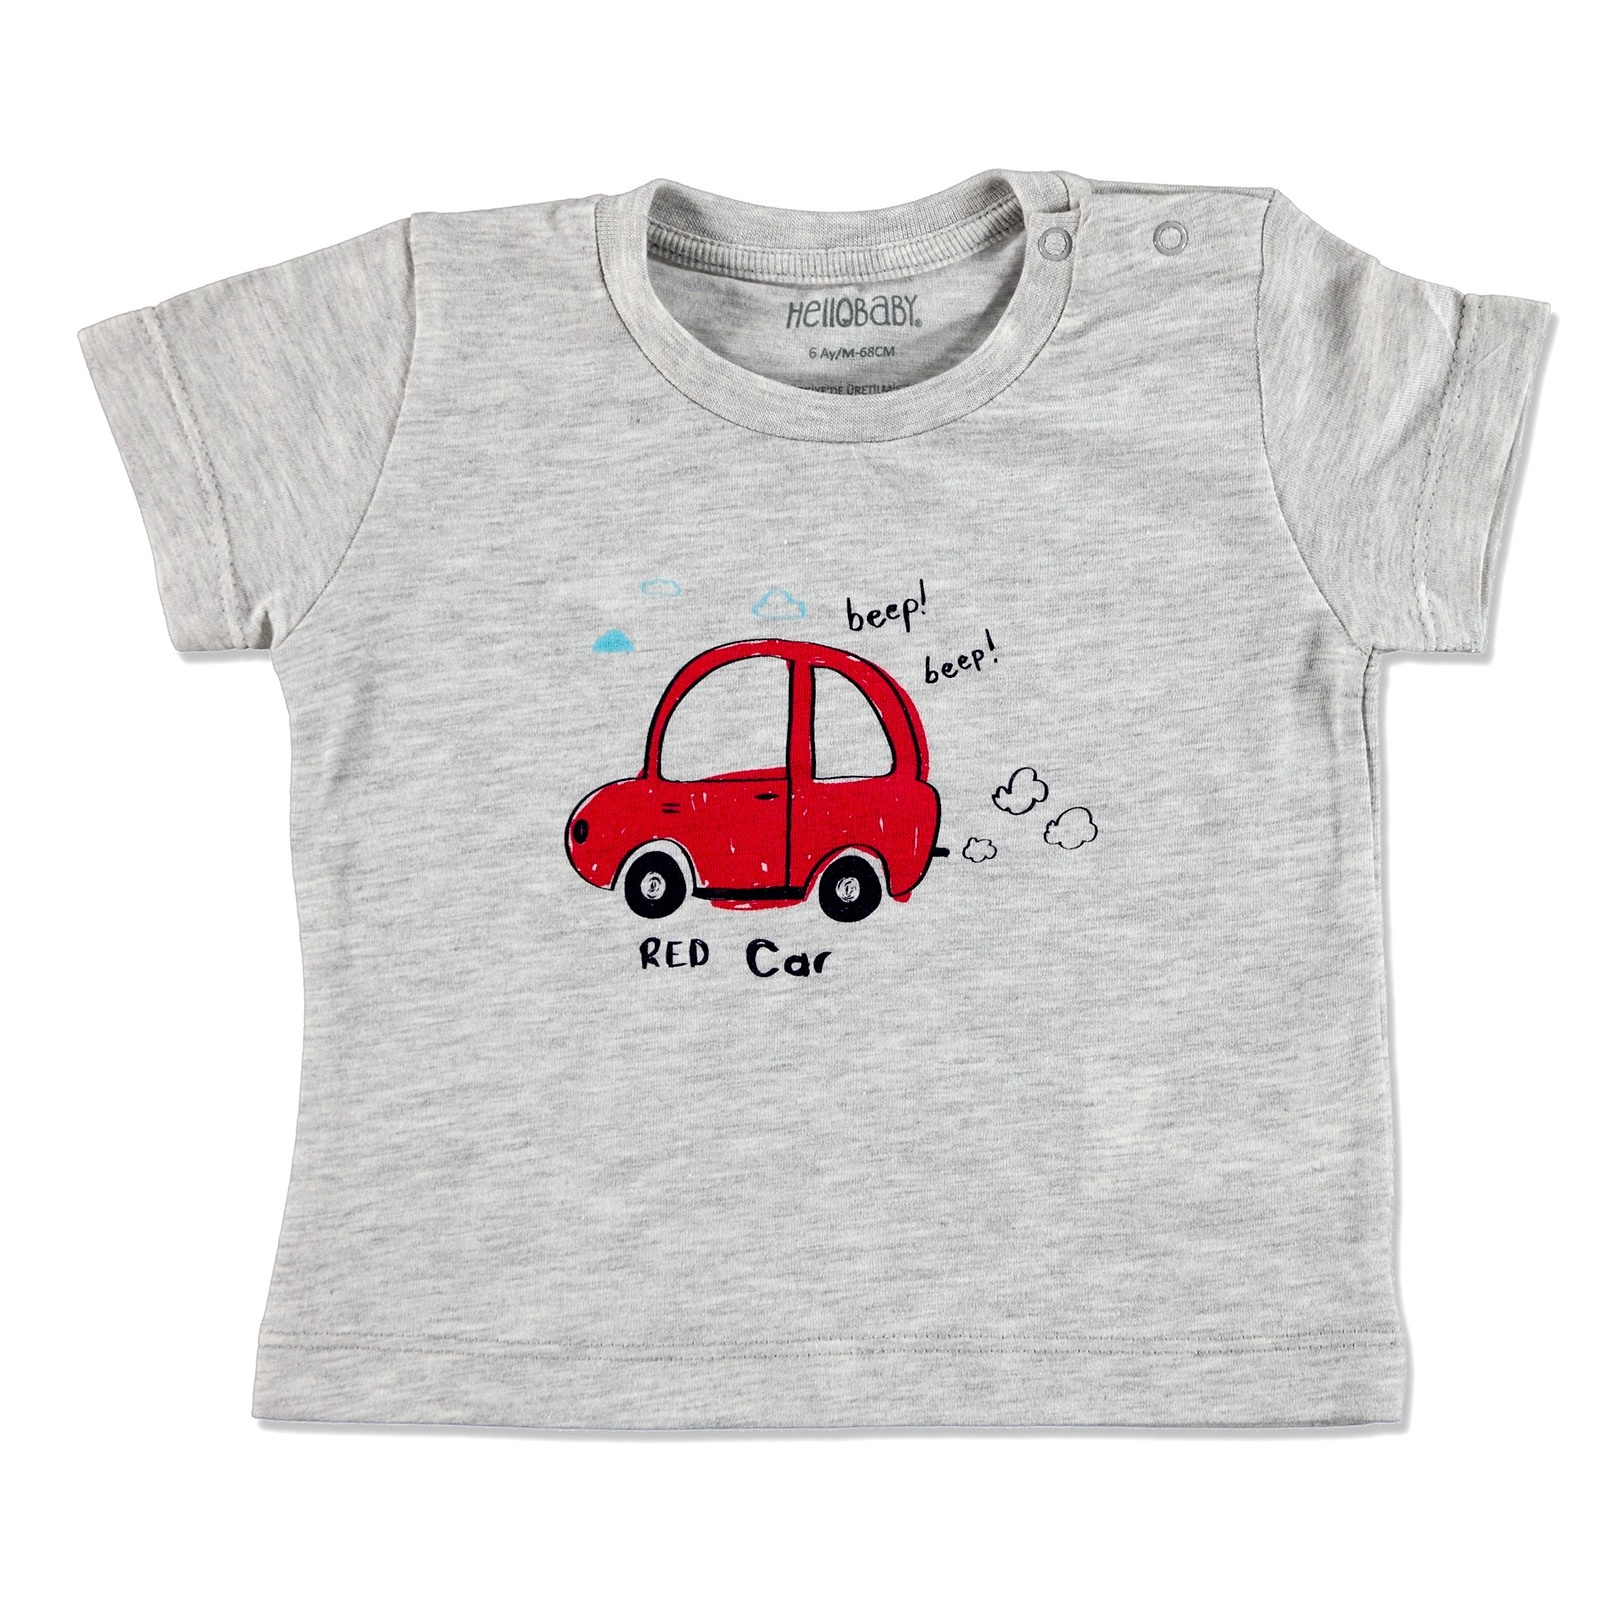 Ebebek HelloBaby Summer Basic Baby Short Sleeve T-shirt